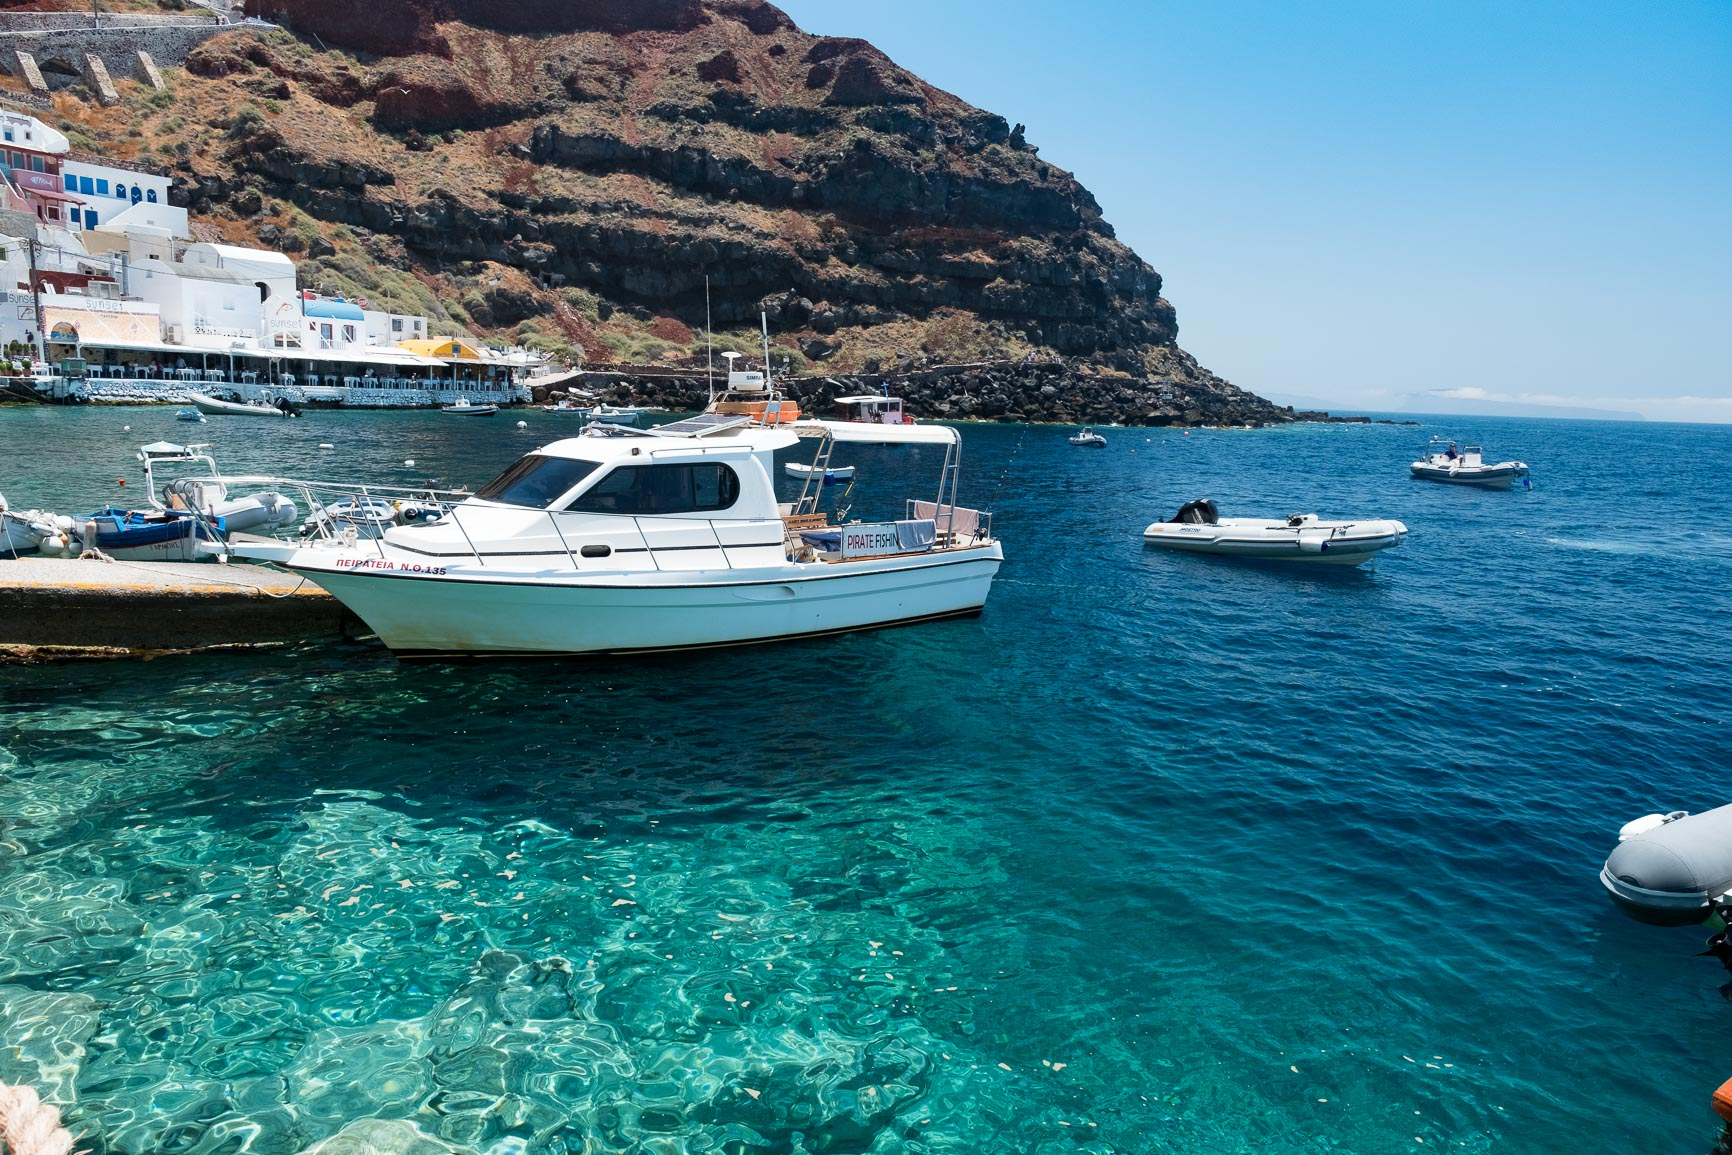 Ammodiboats.jpg